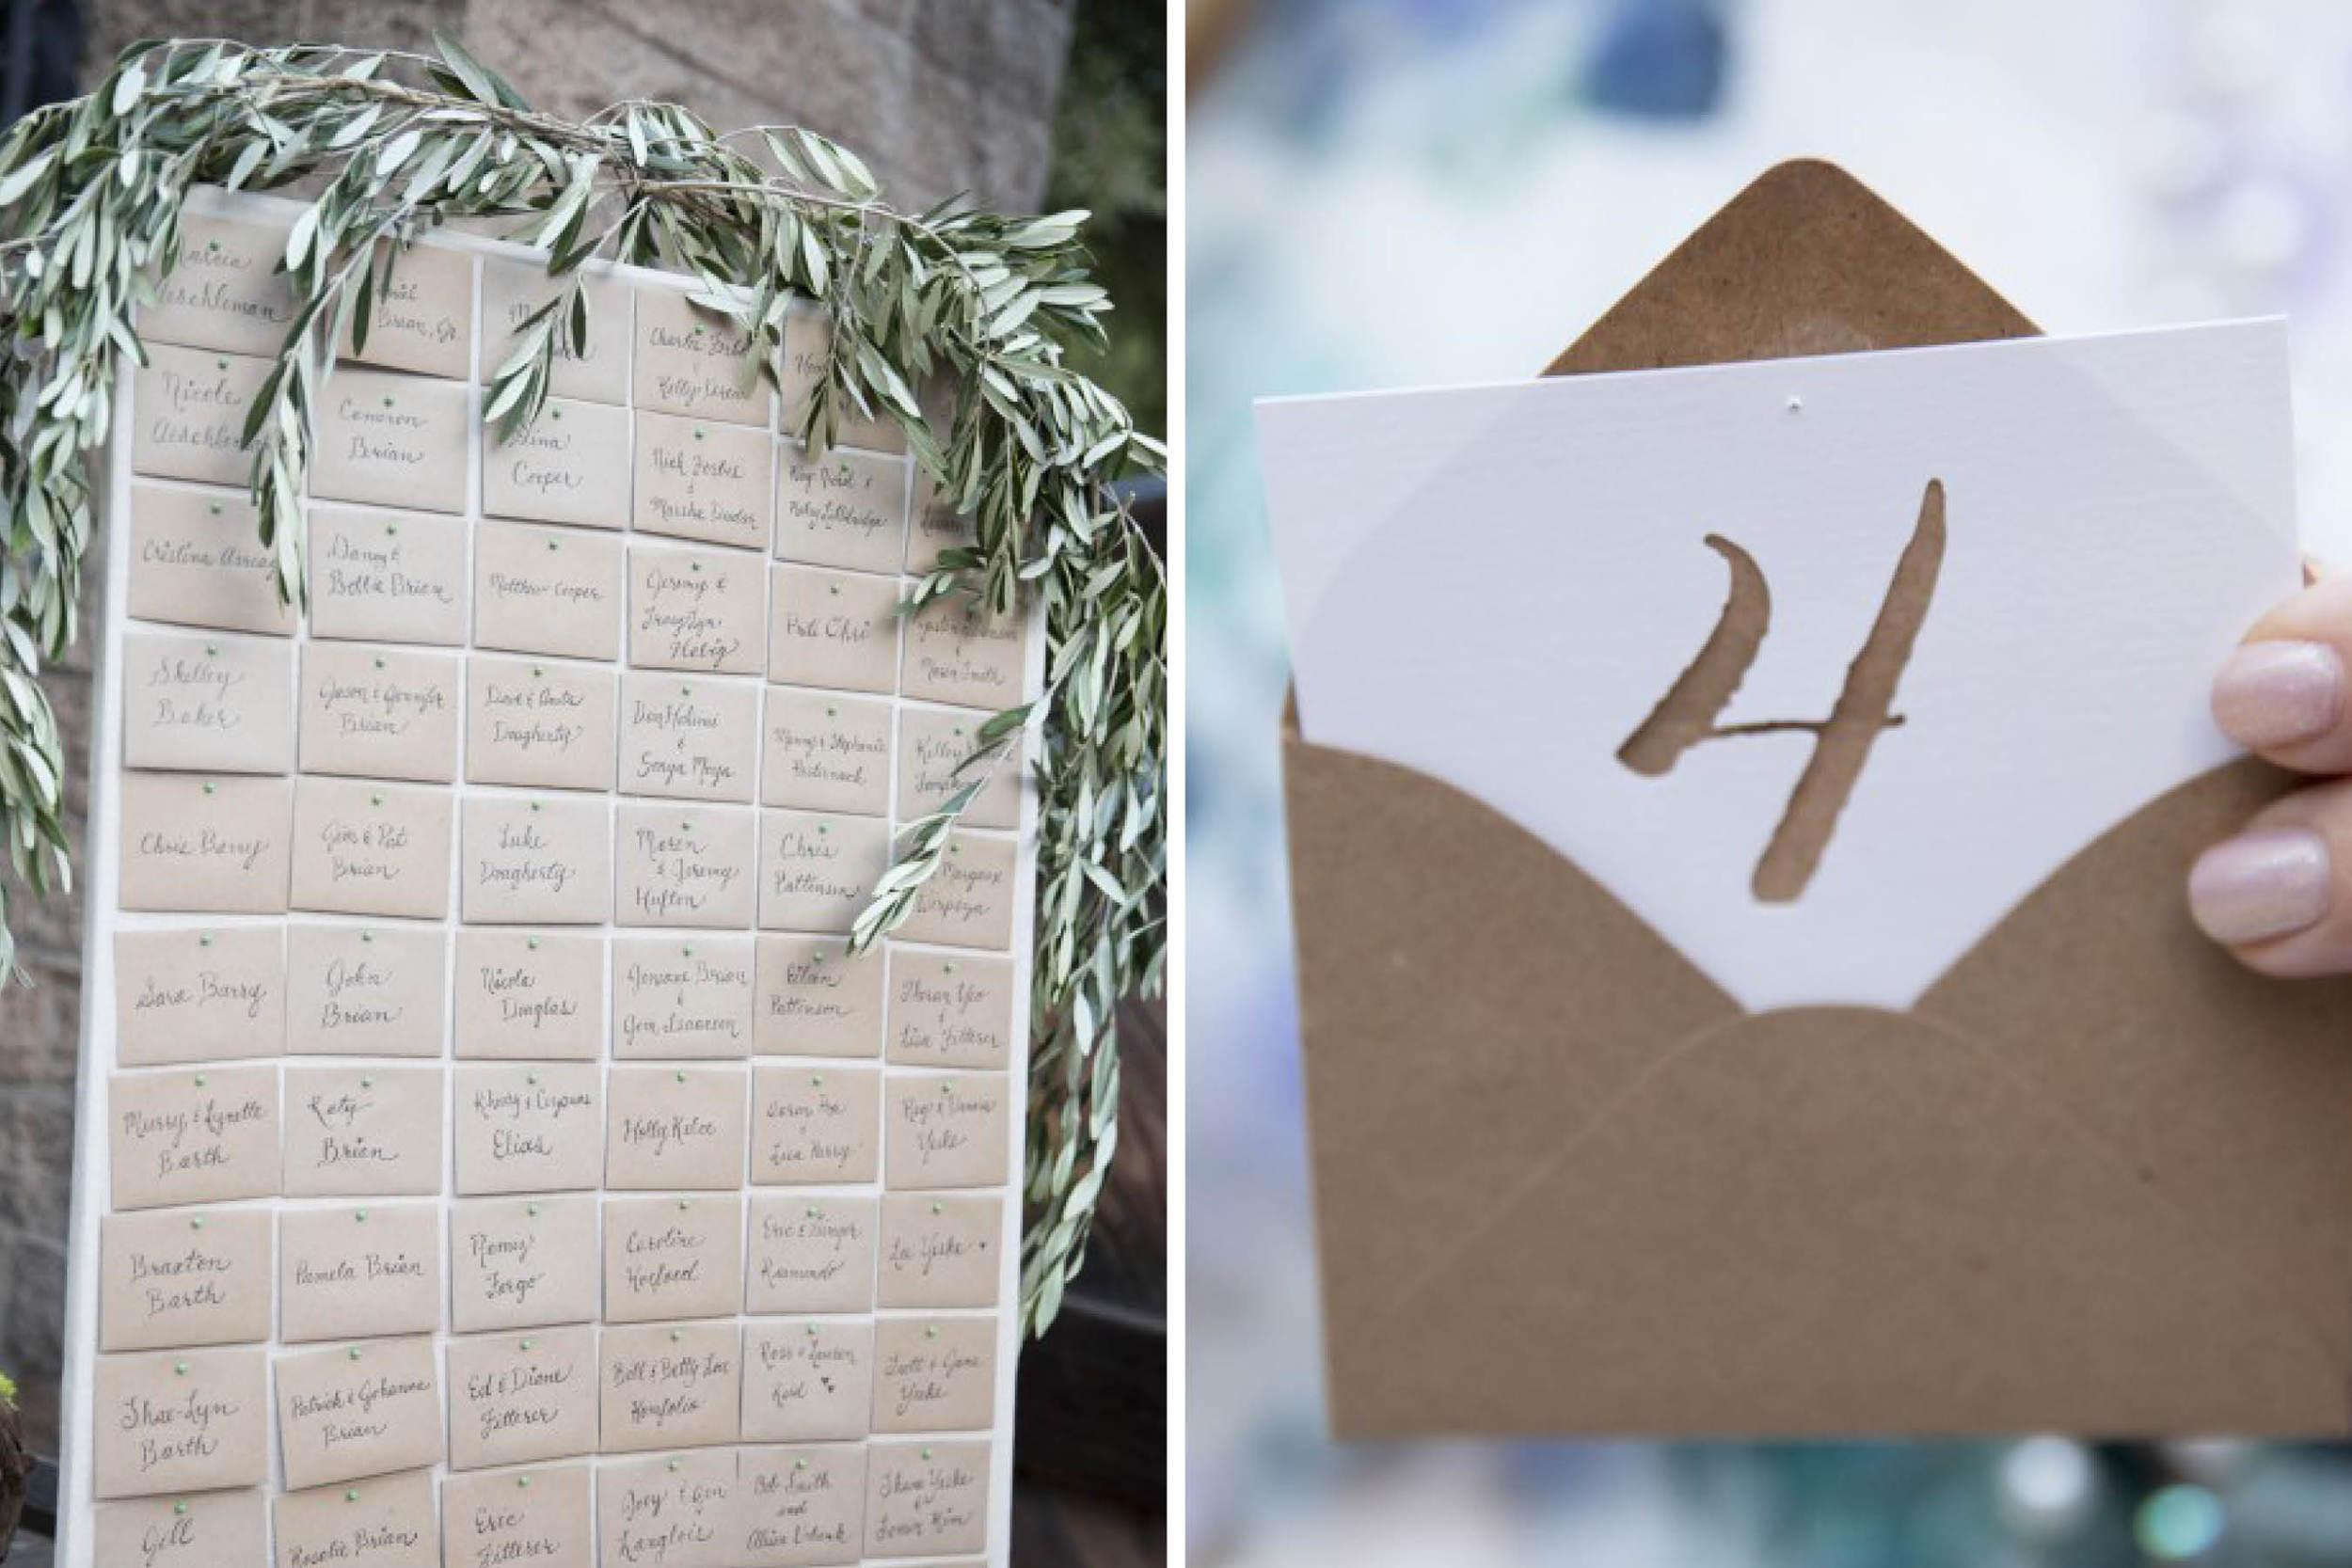 firestone-winery-vineyard-wedding-planner-coordinator-santa-barbara-ynez-los-olivos (23).jpg